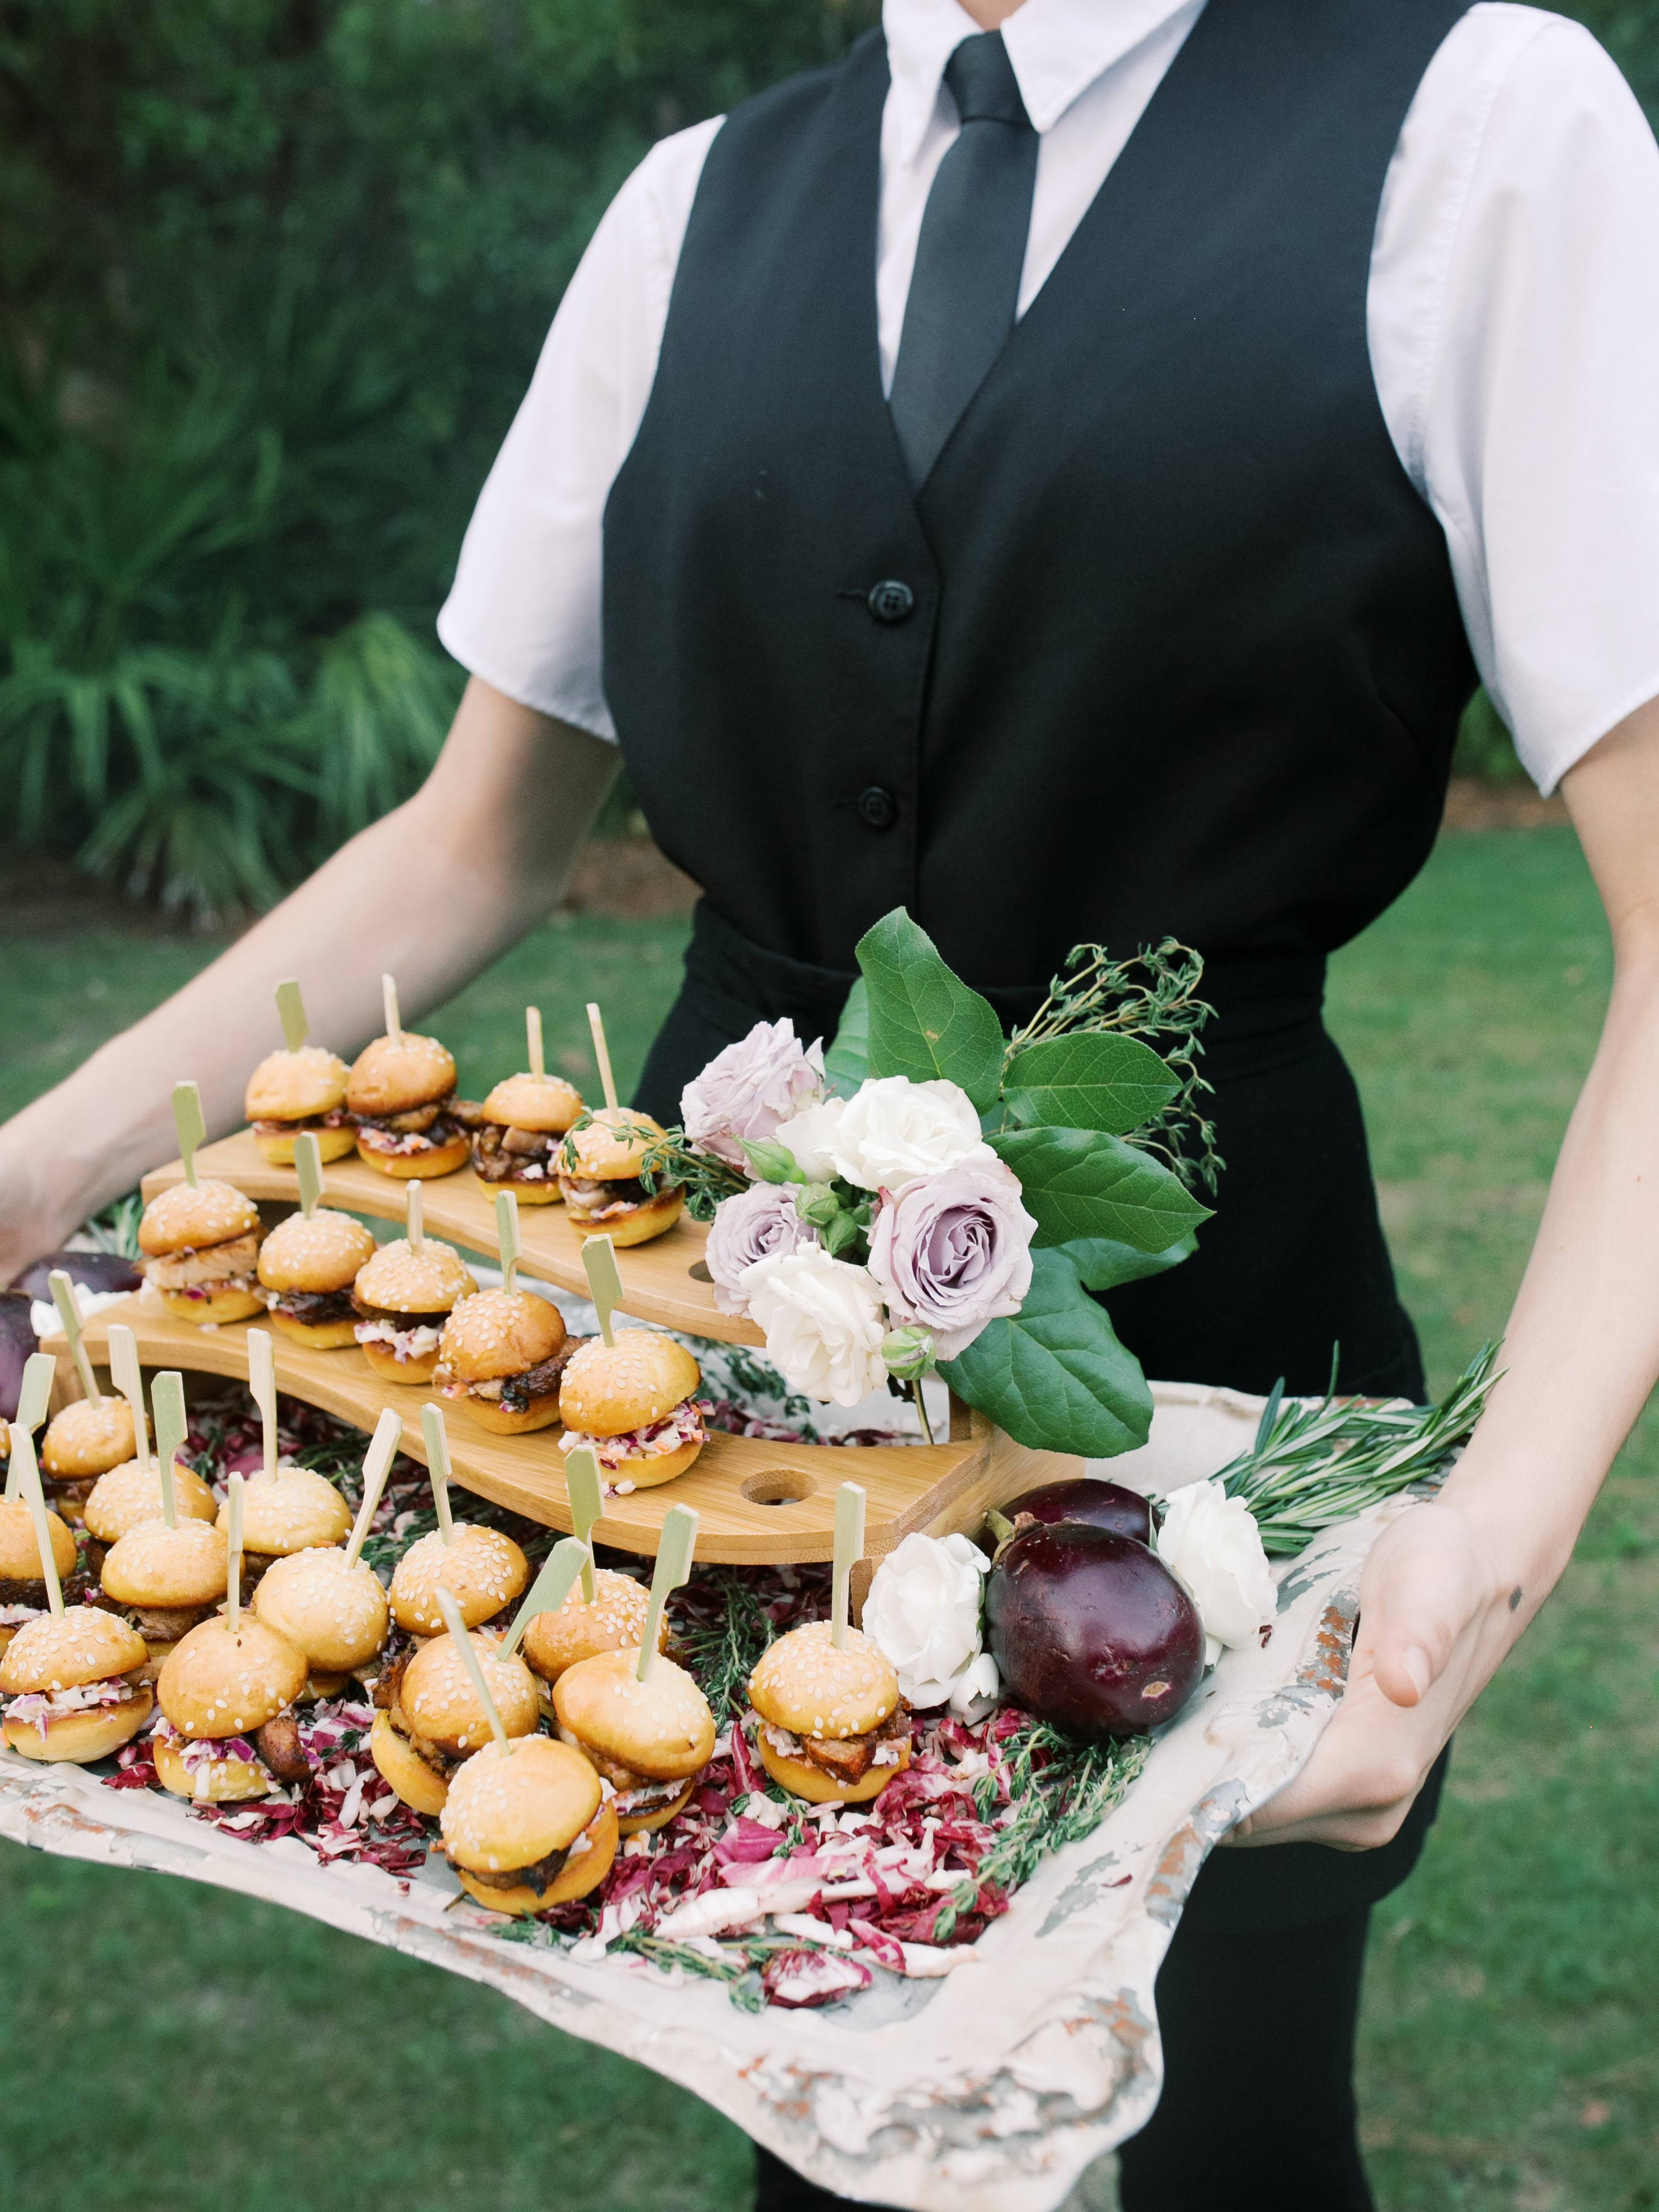 leighton craig wedding food tray with sliders